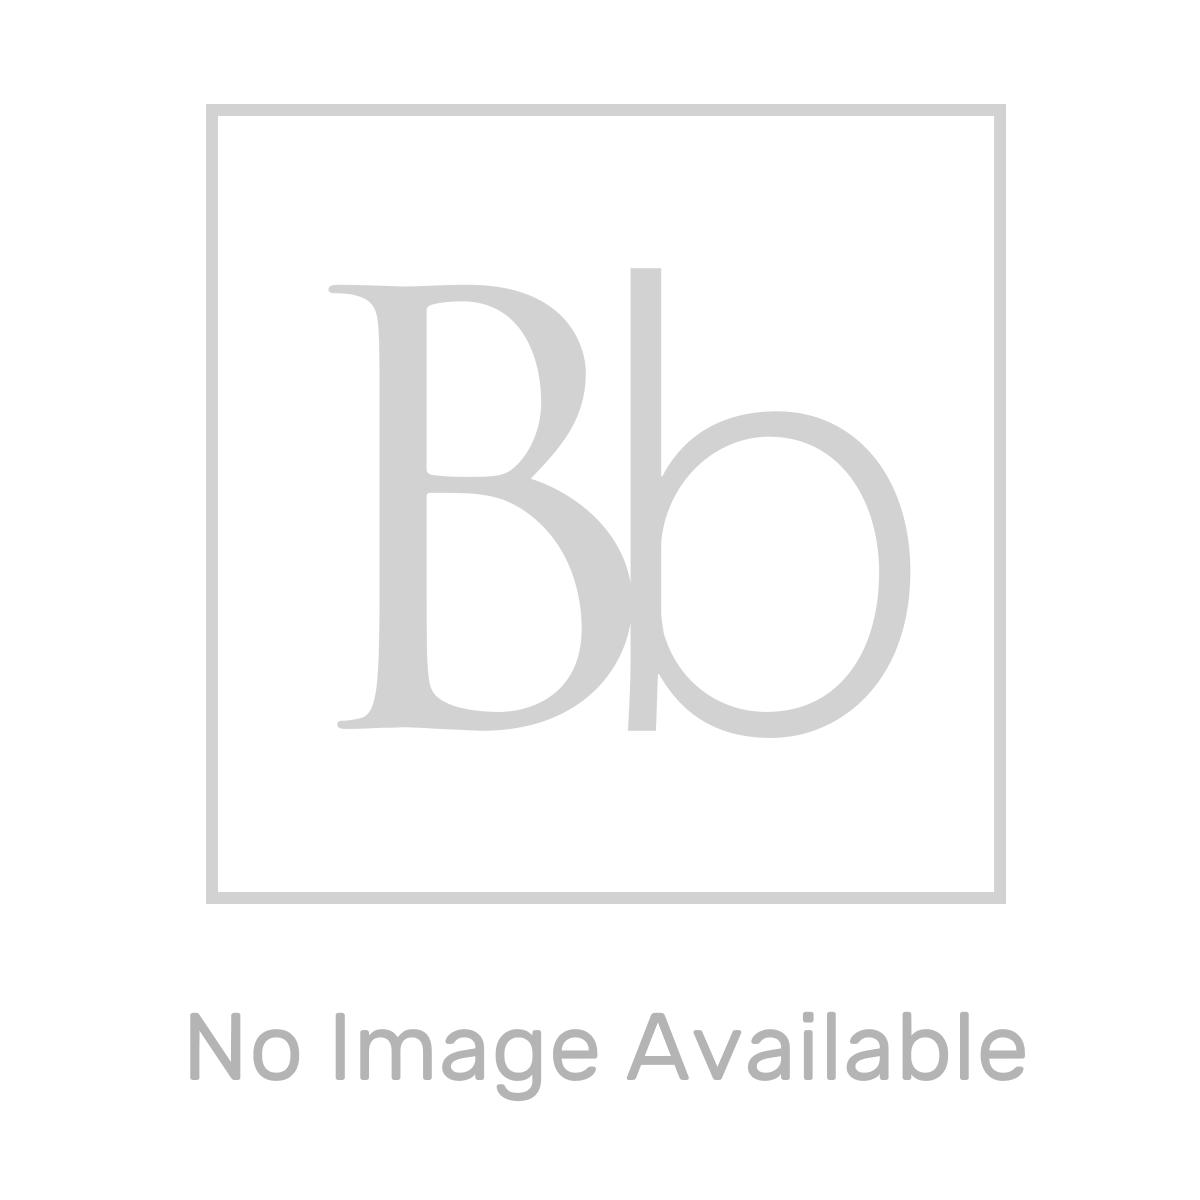 RAK Feeling Side Panel Fixing Kit Measurements